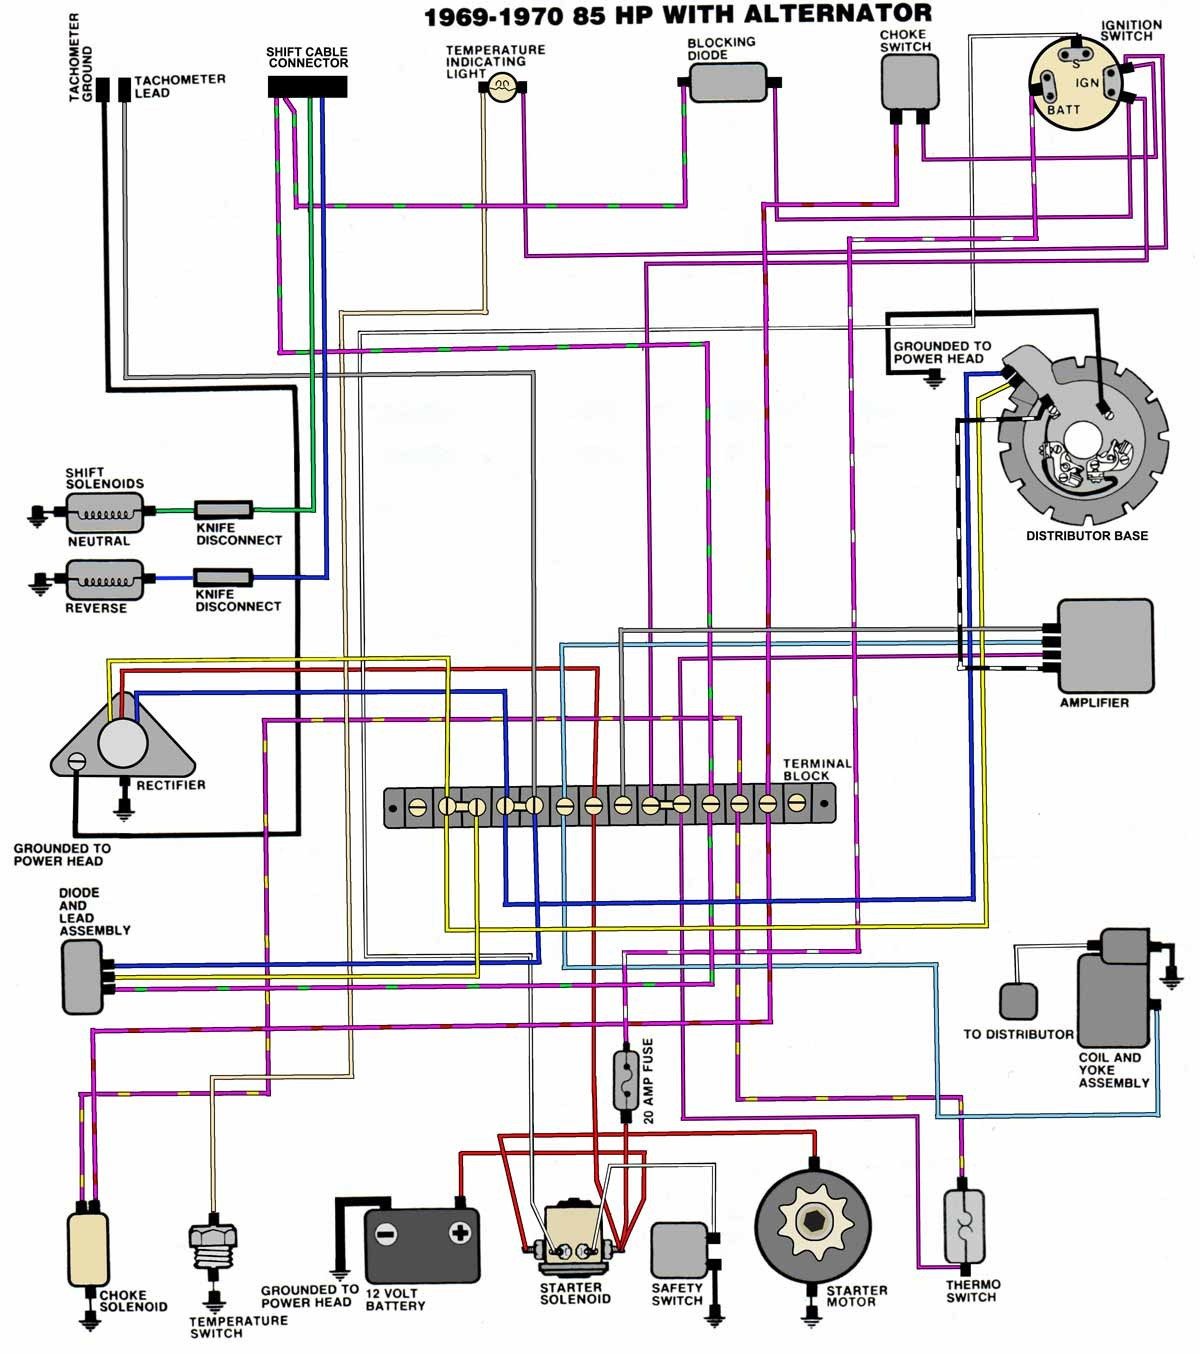 Evinrude Ignition Wiring Diagram - General Wiring Diagram